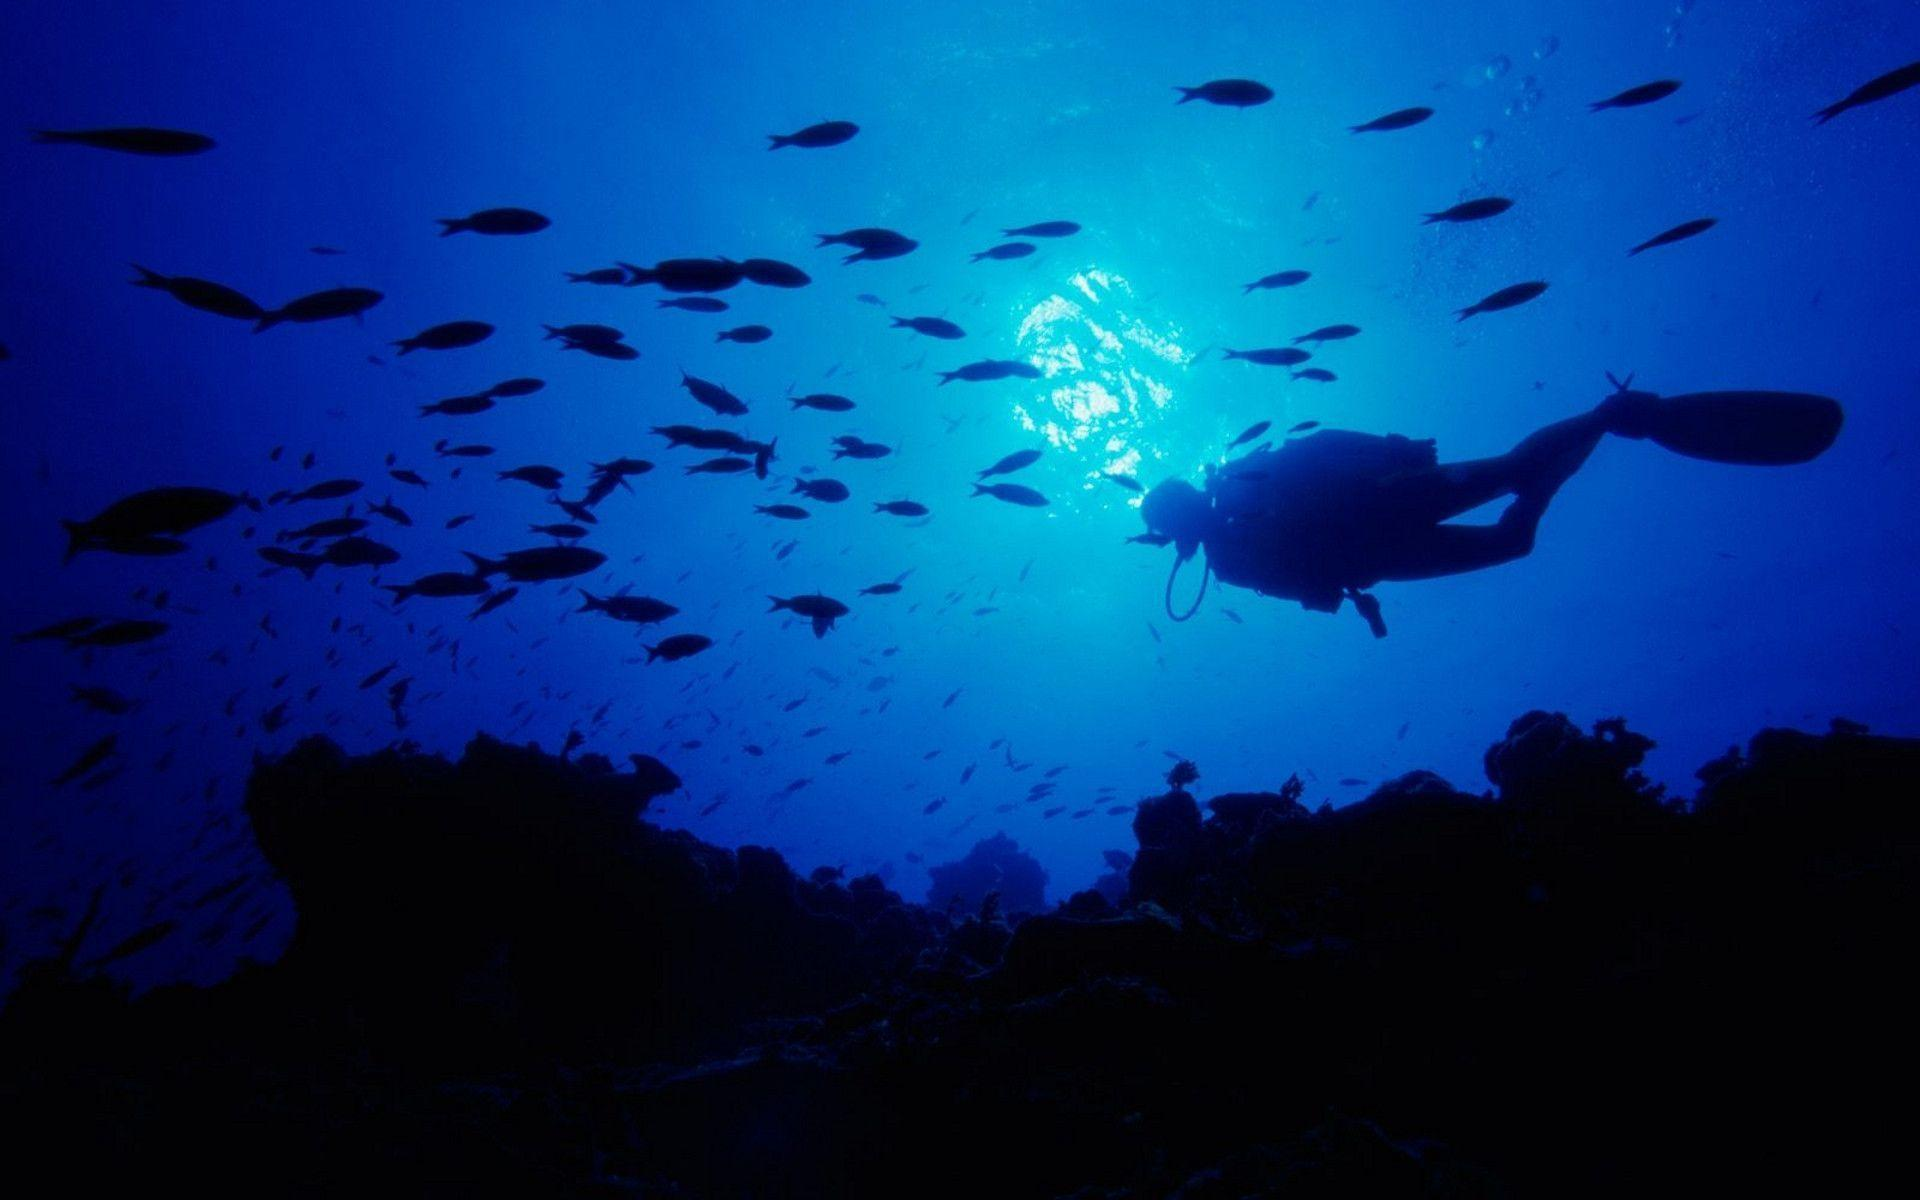 scuba diving wallpaper wallpapers - photo #2